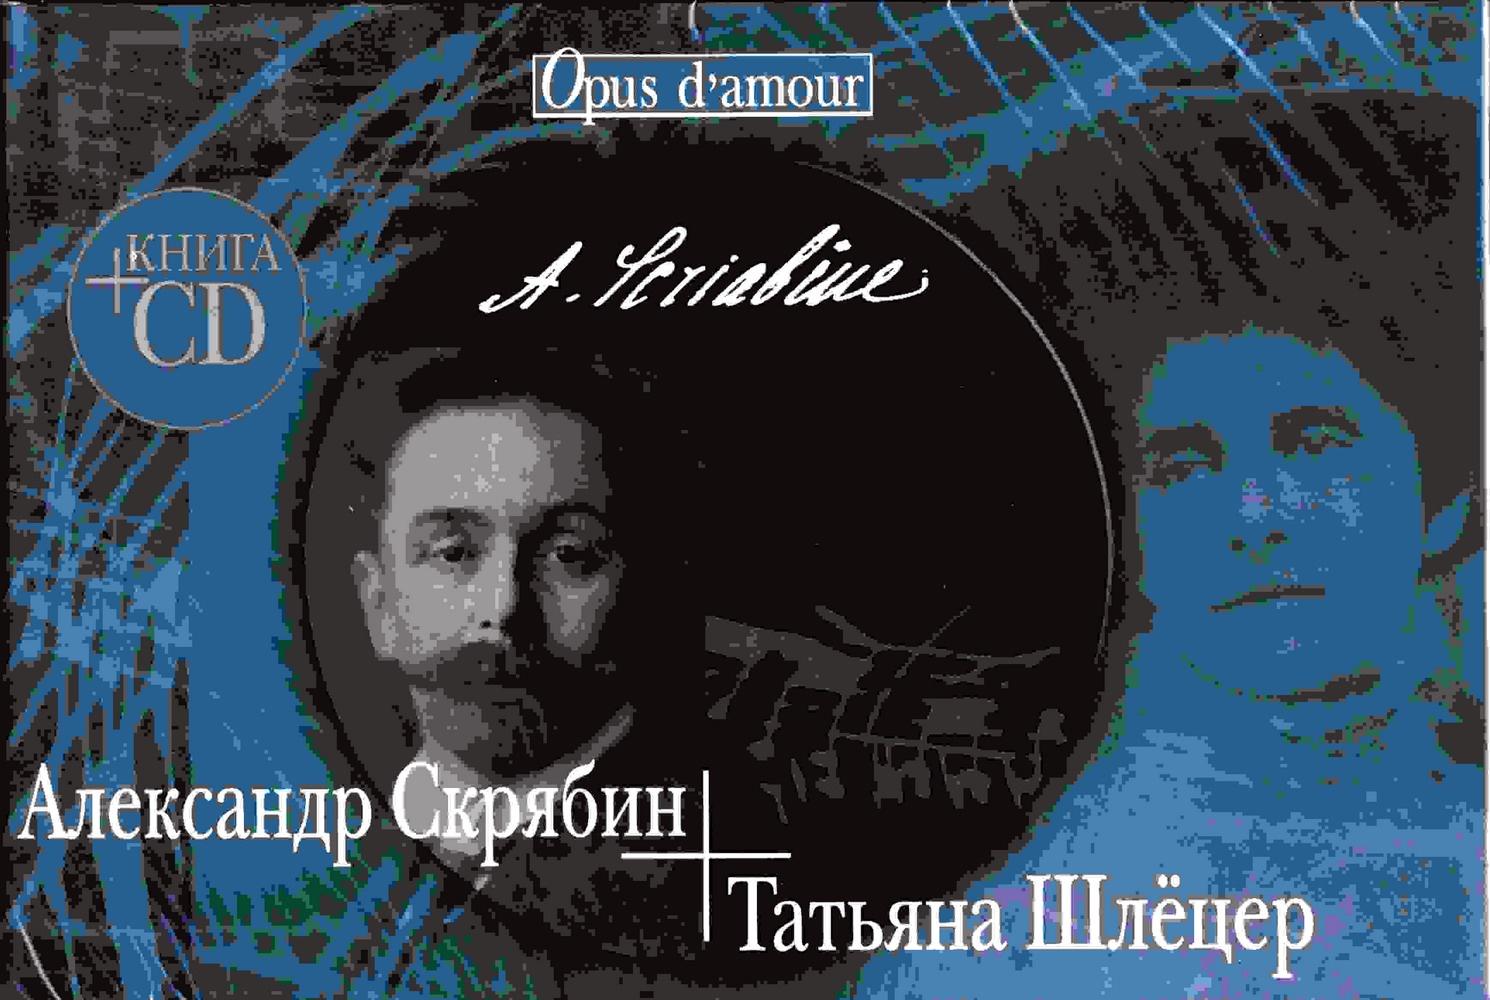 А. Бандура Александр Скрябин - Татьяна Шлёцер (+CD)